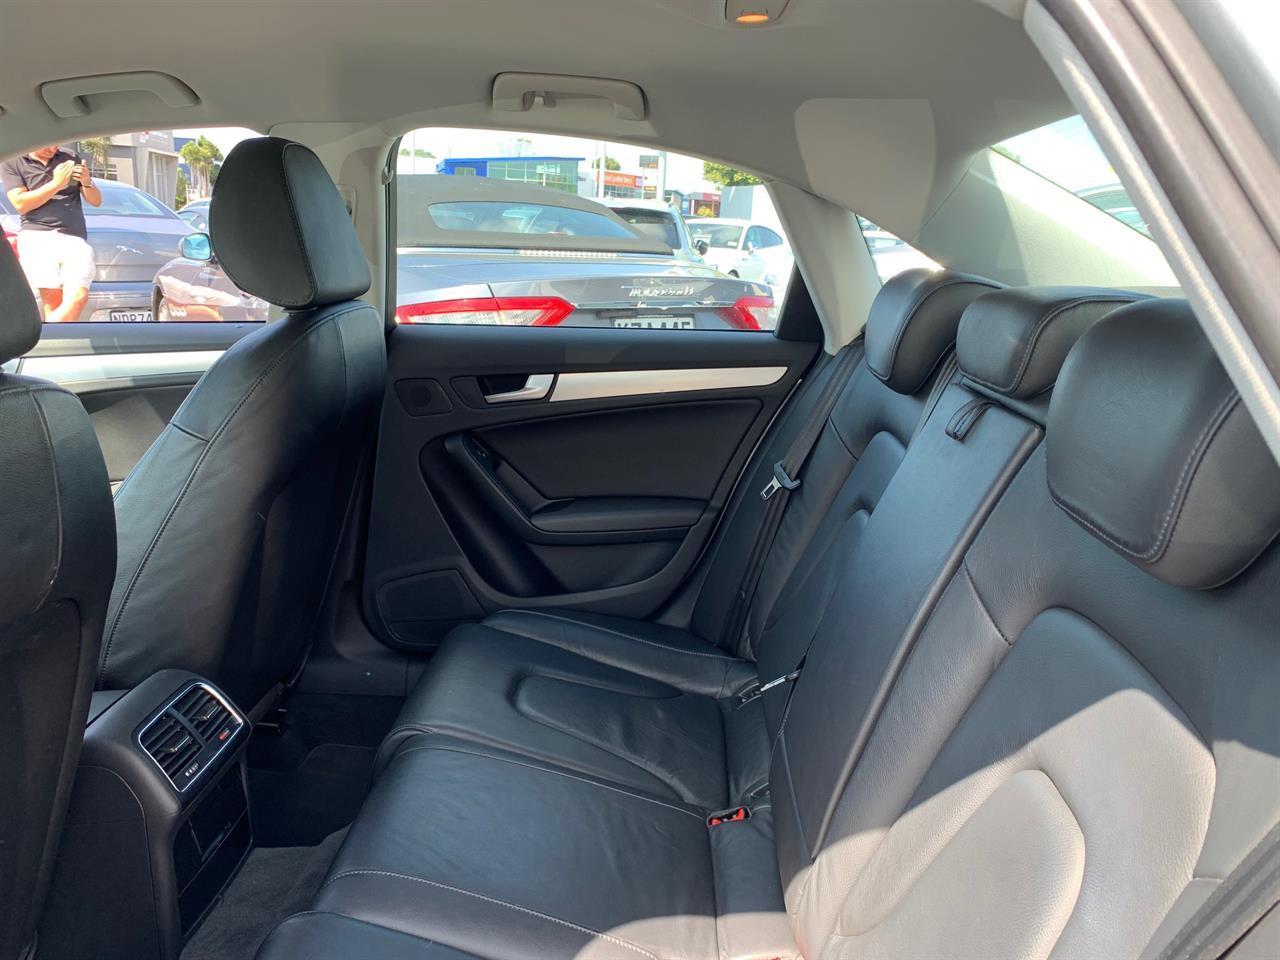 image-6, 2008 Audi A4 2.7 TDI V6 Sedan at Christchurch